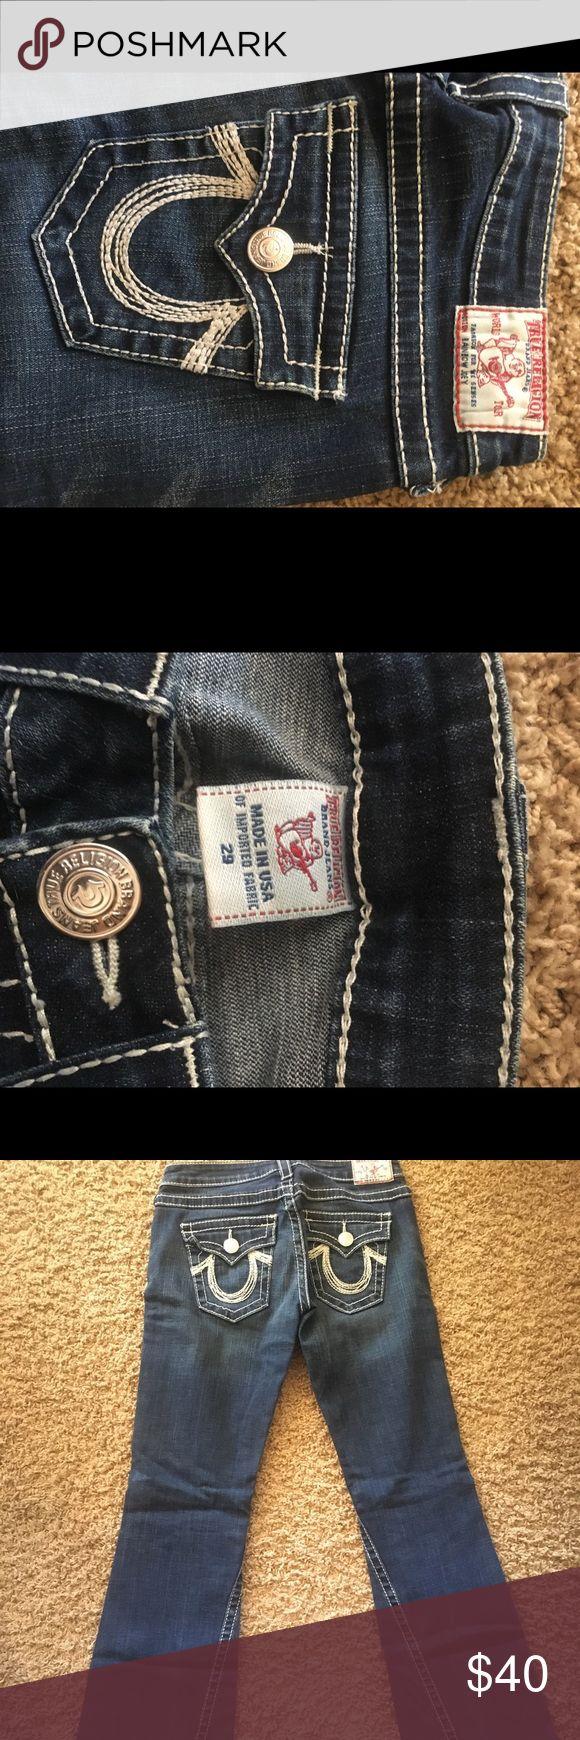 True religion jeans True religions in great condition. Size 29 True Religion Jeans Flare & Wide Leg